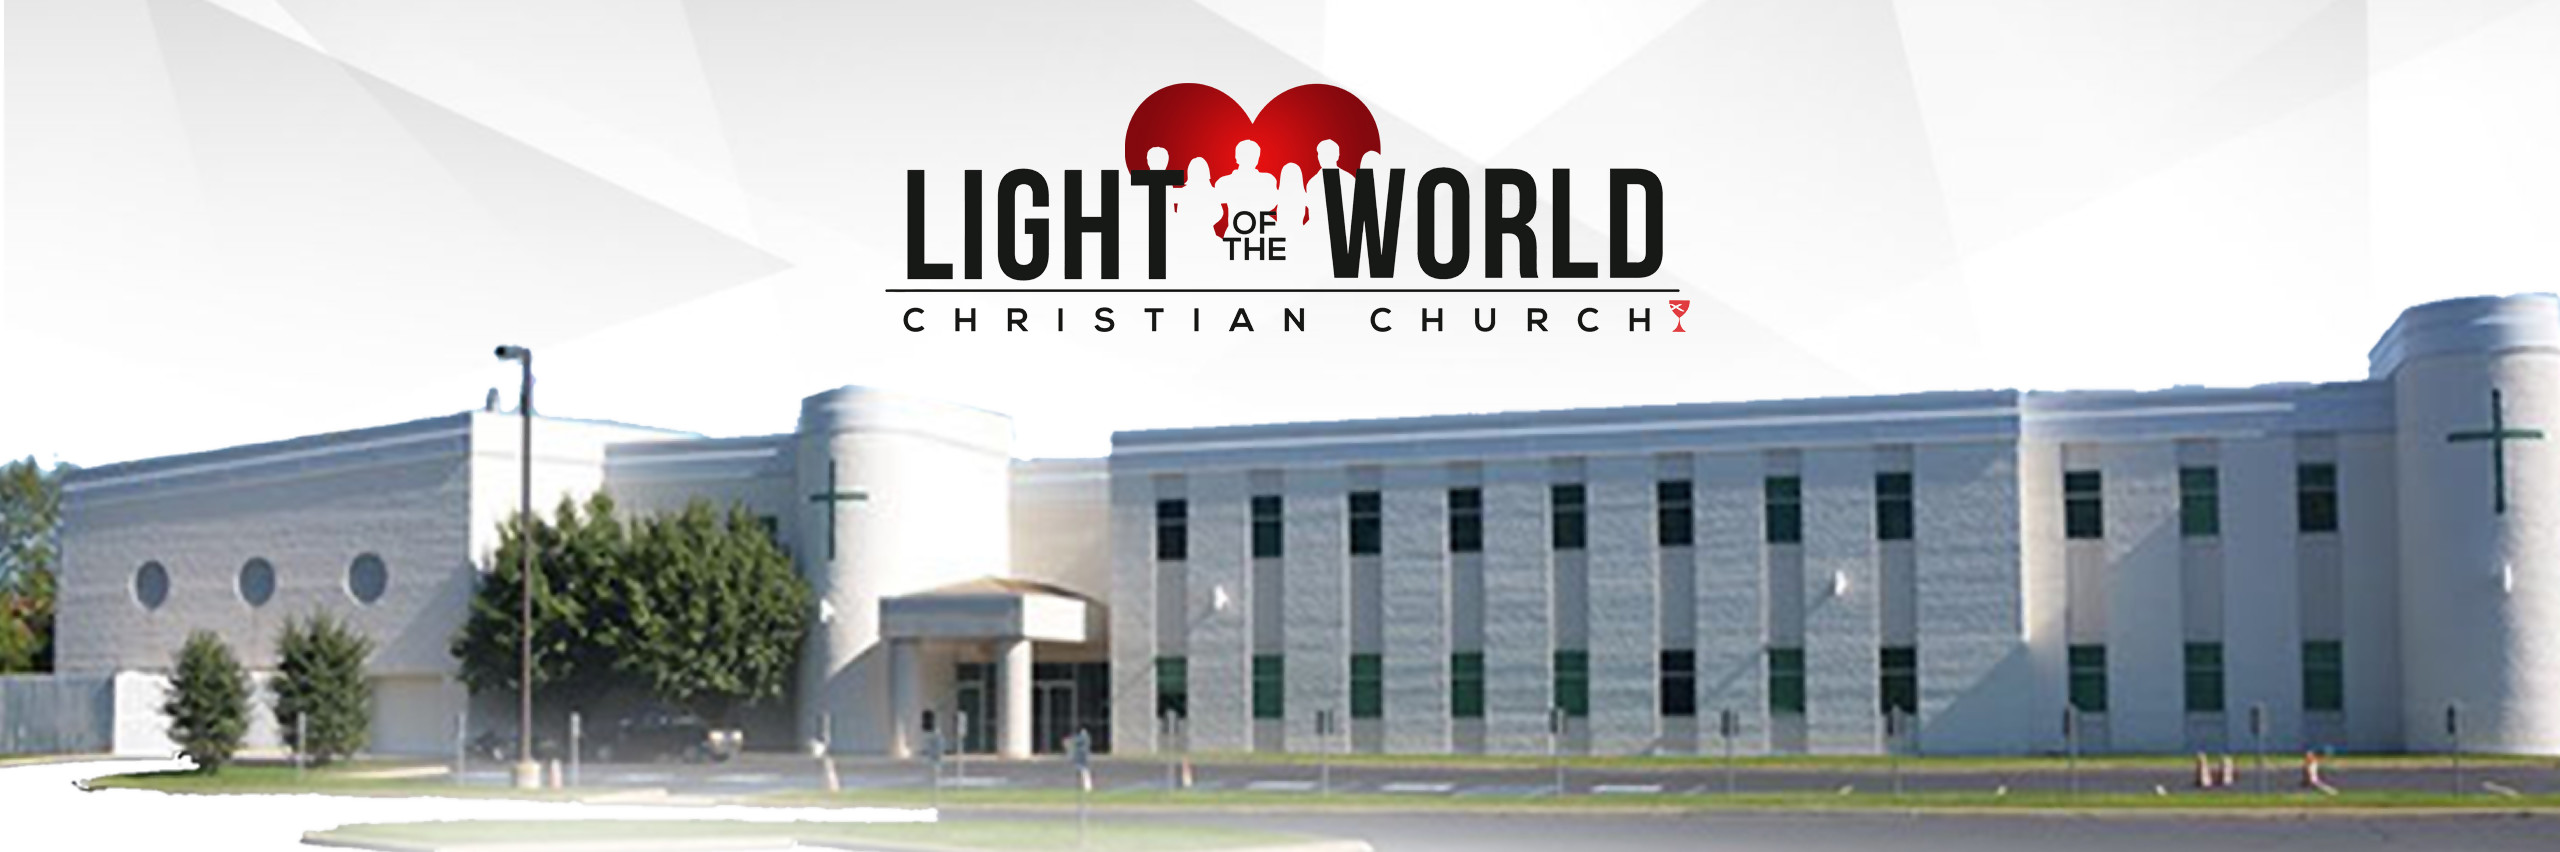 Light Of The World Christian Church